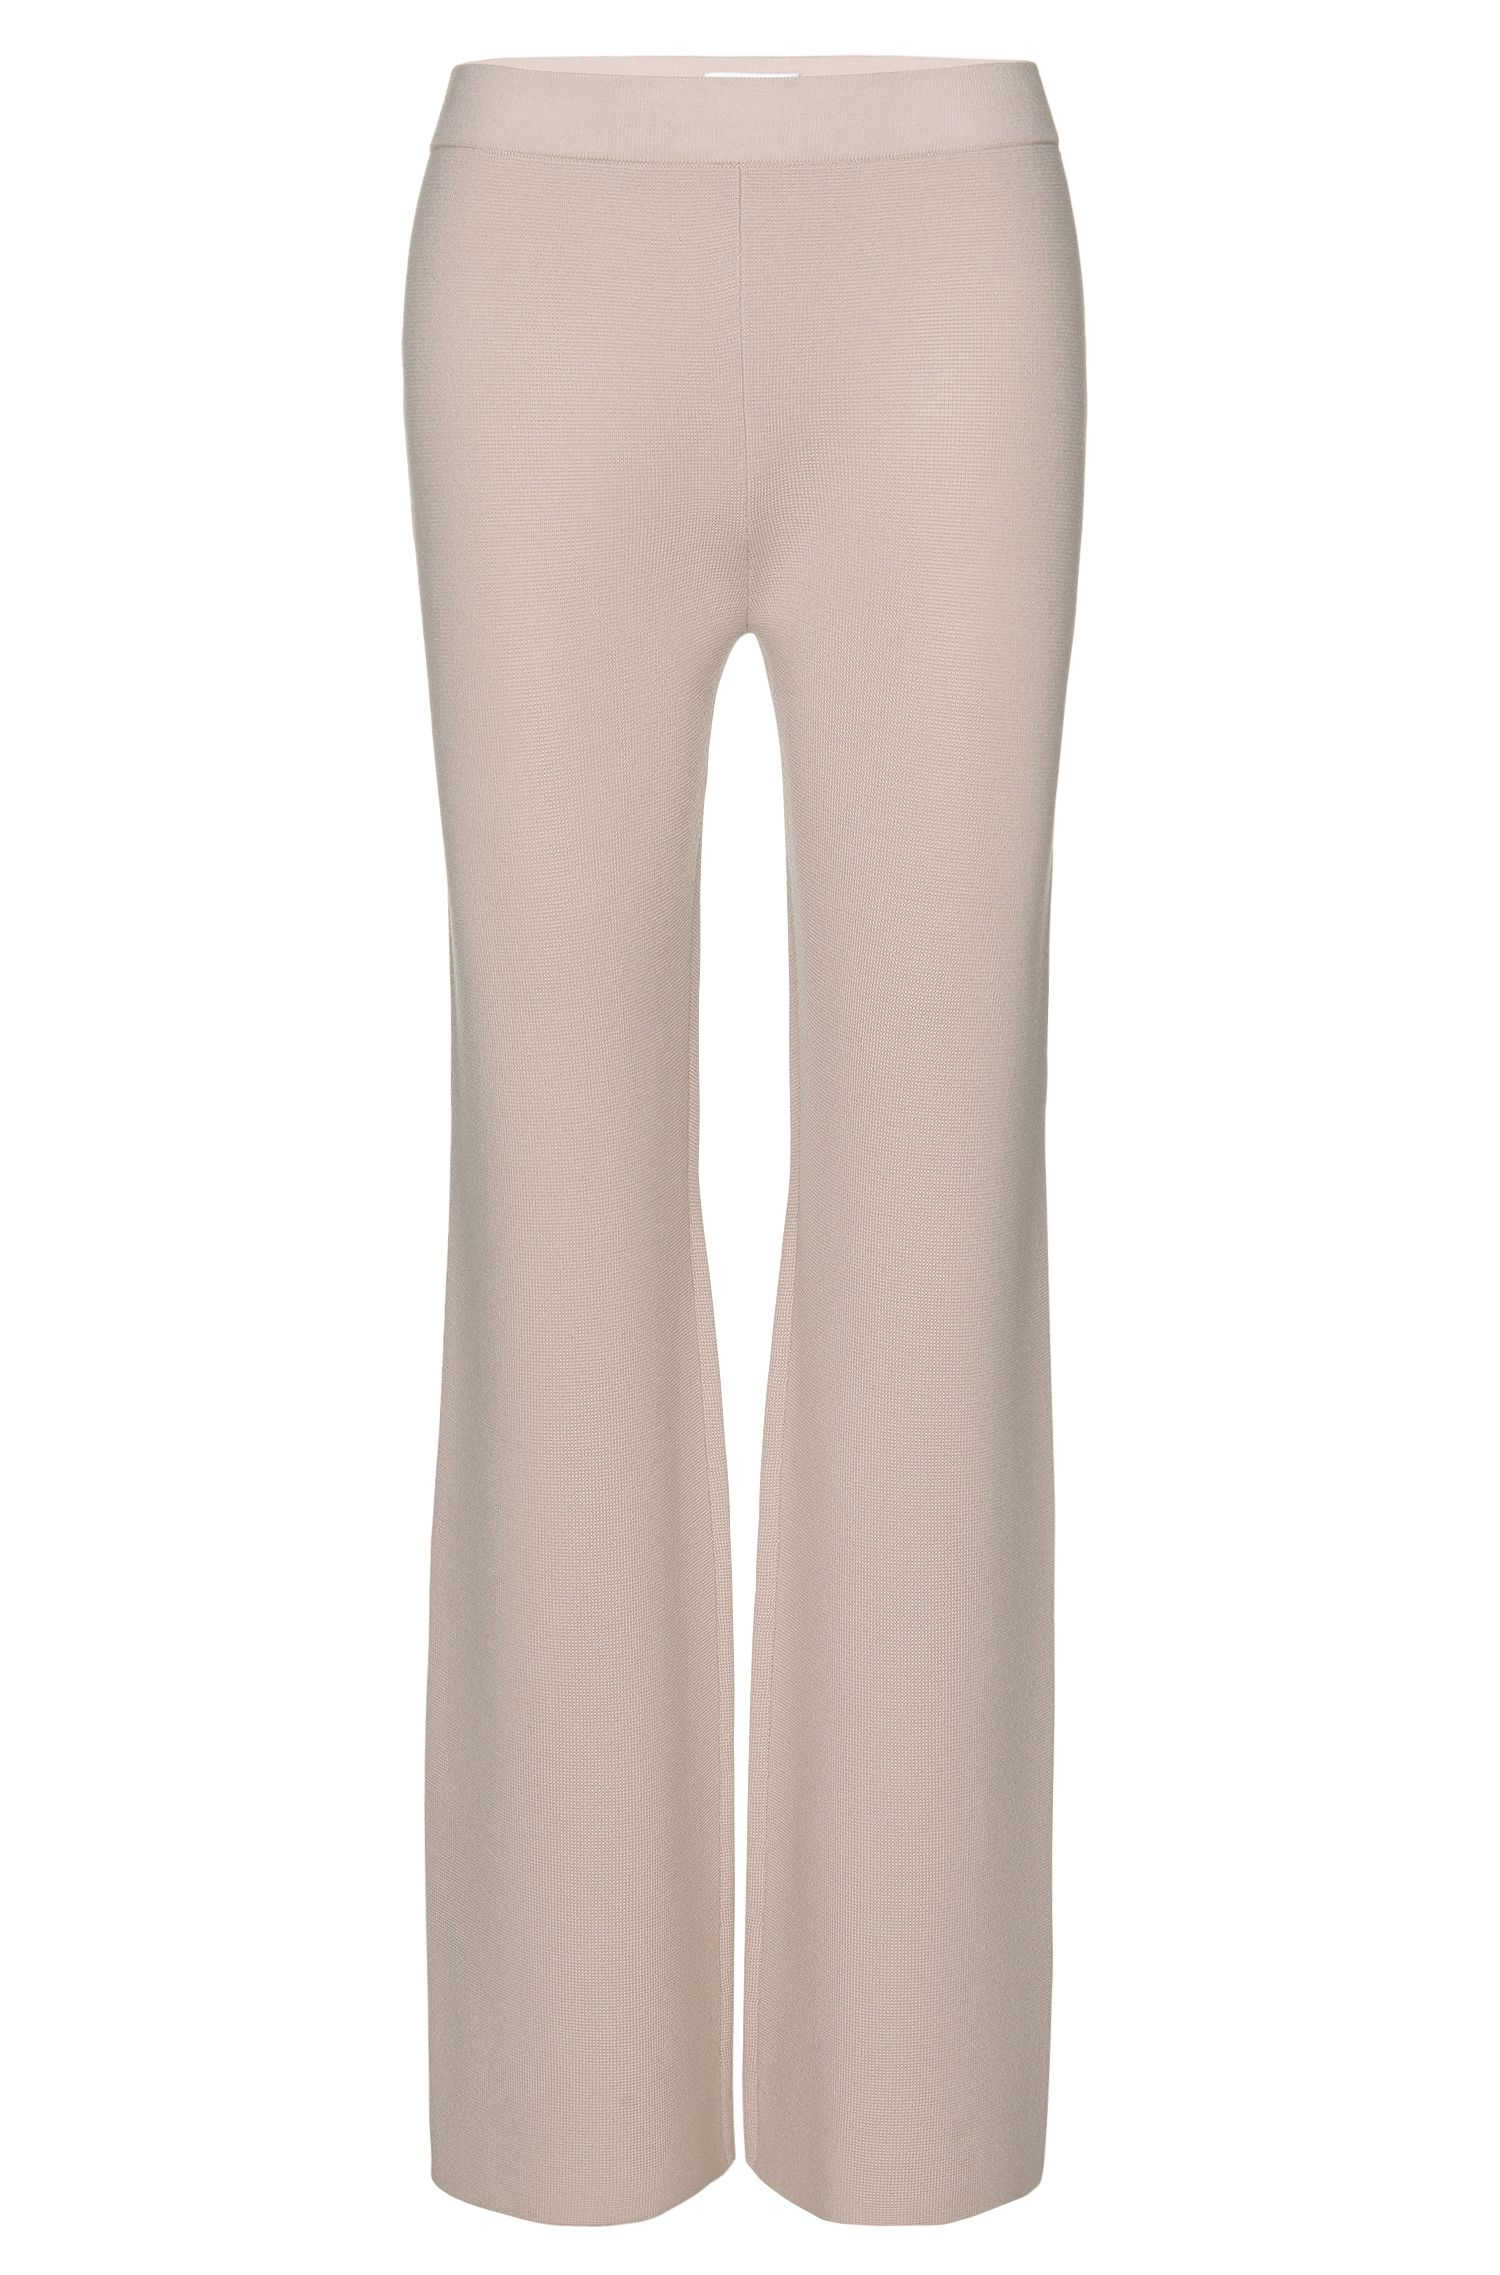 Mercerized Virgin Wool Knit Pant | Falali